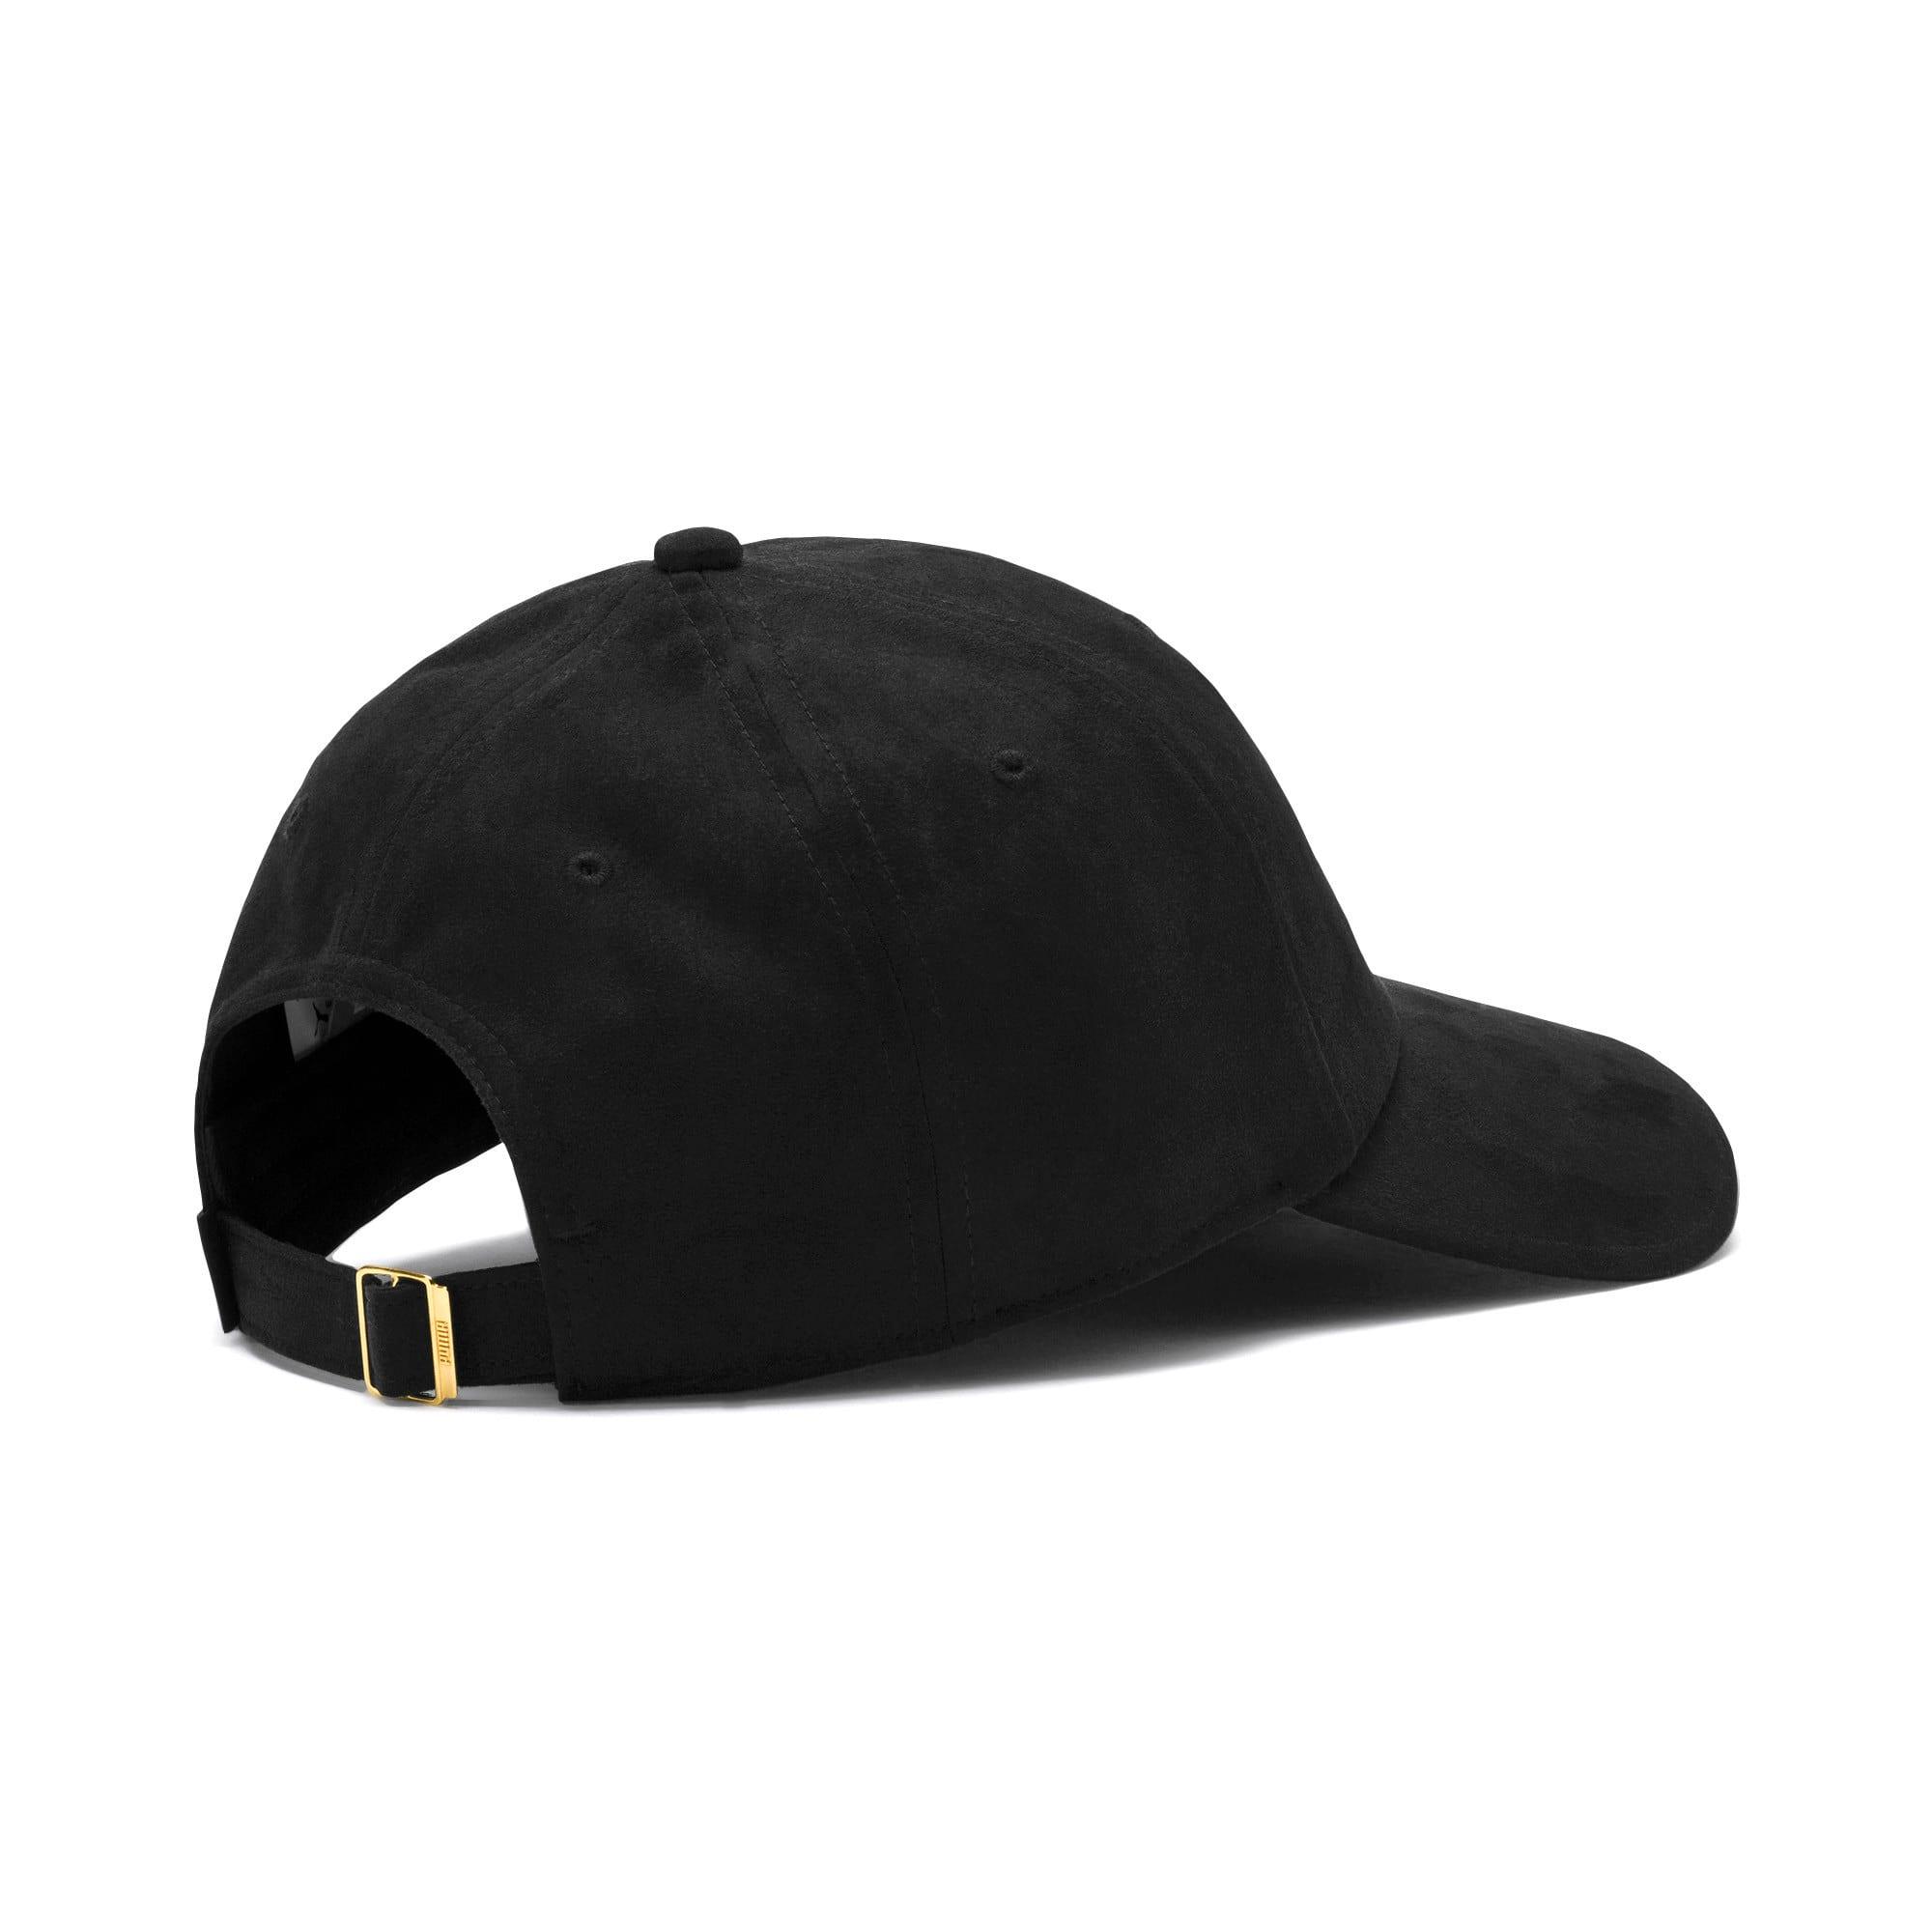 Thumbnail 3 of Winterised Suede Baseball Cap, Puma Black, medium-IND